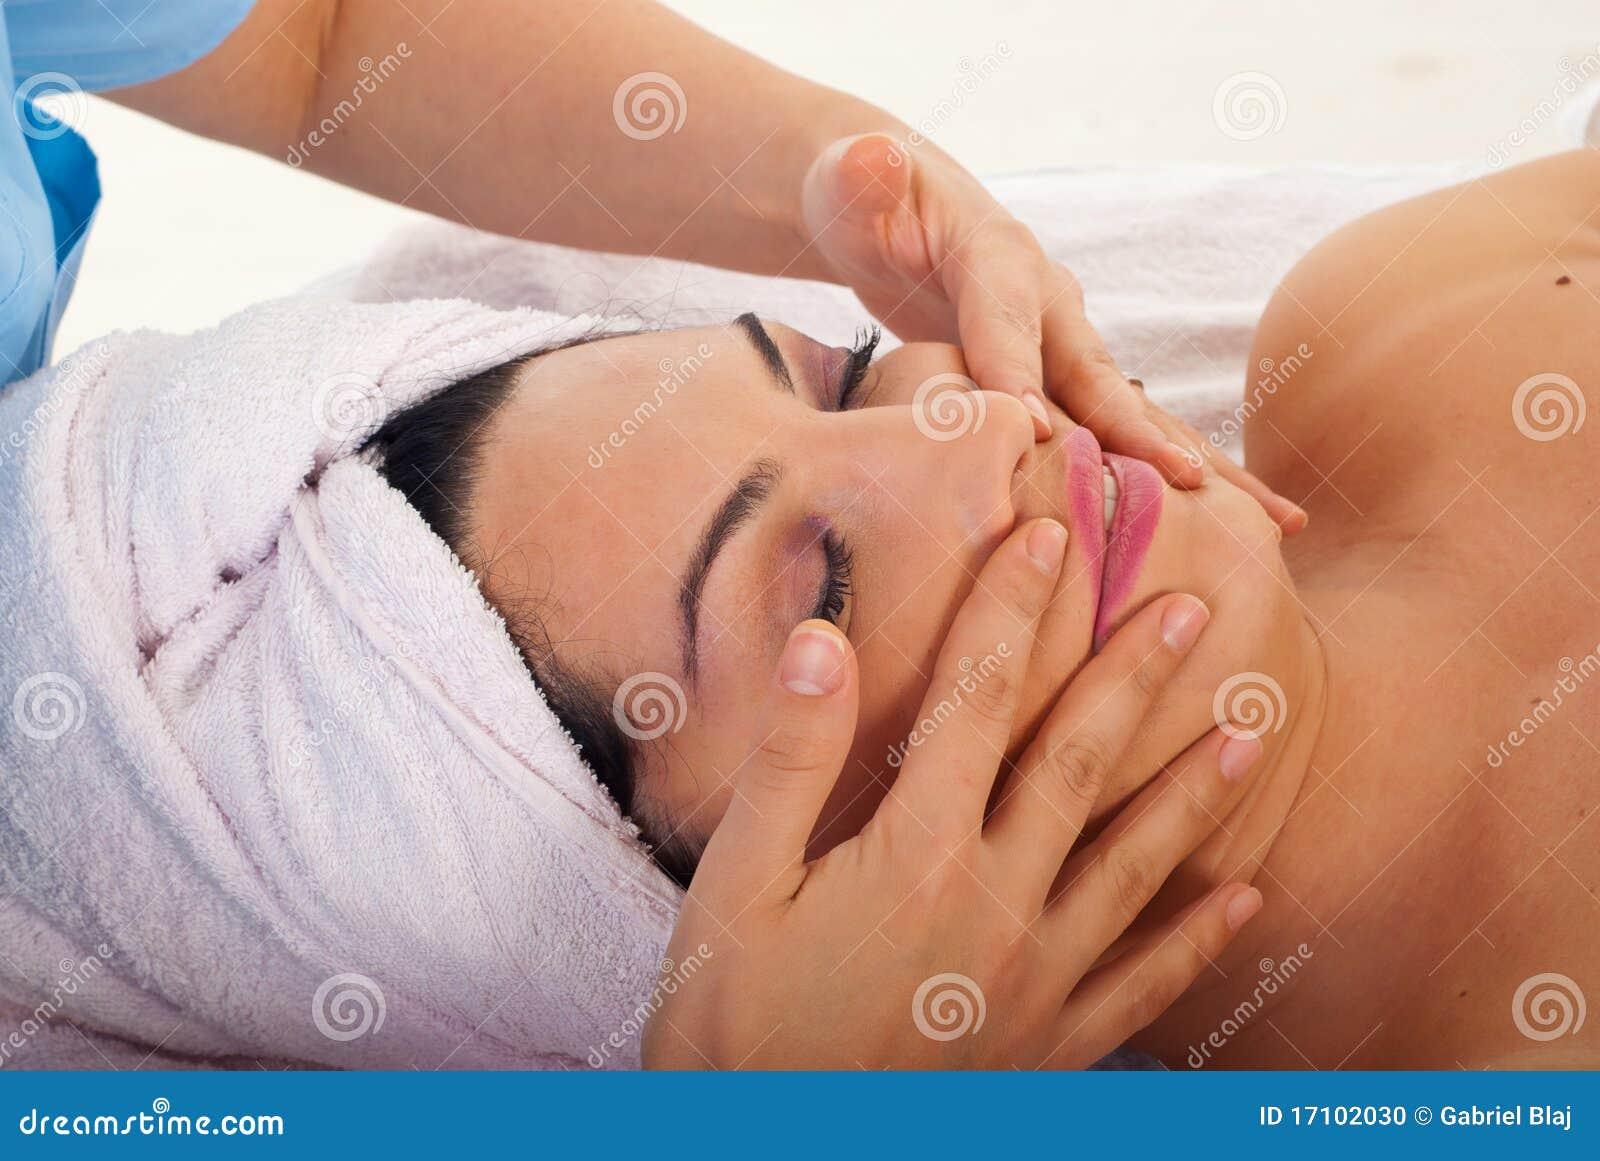 mulheres em viseu massagens net pt